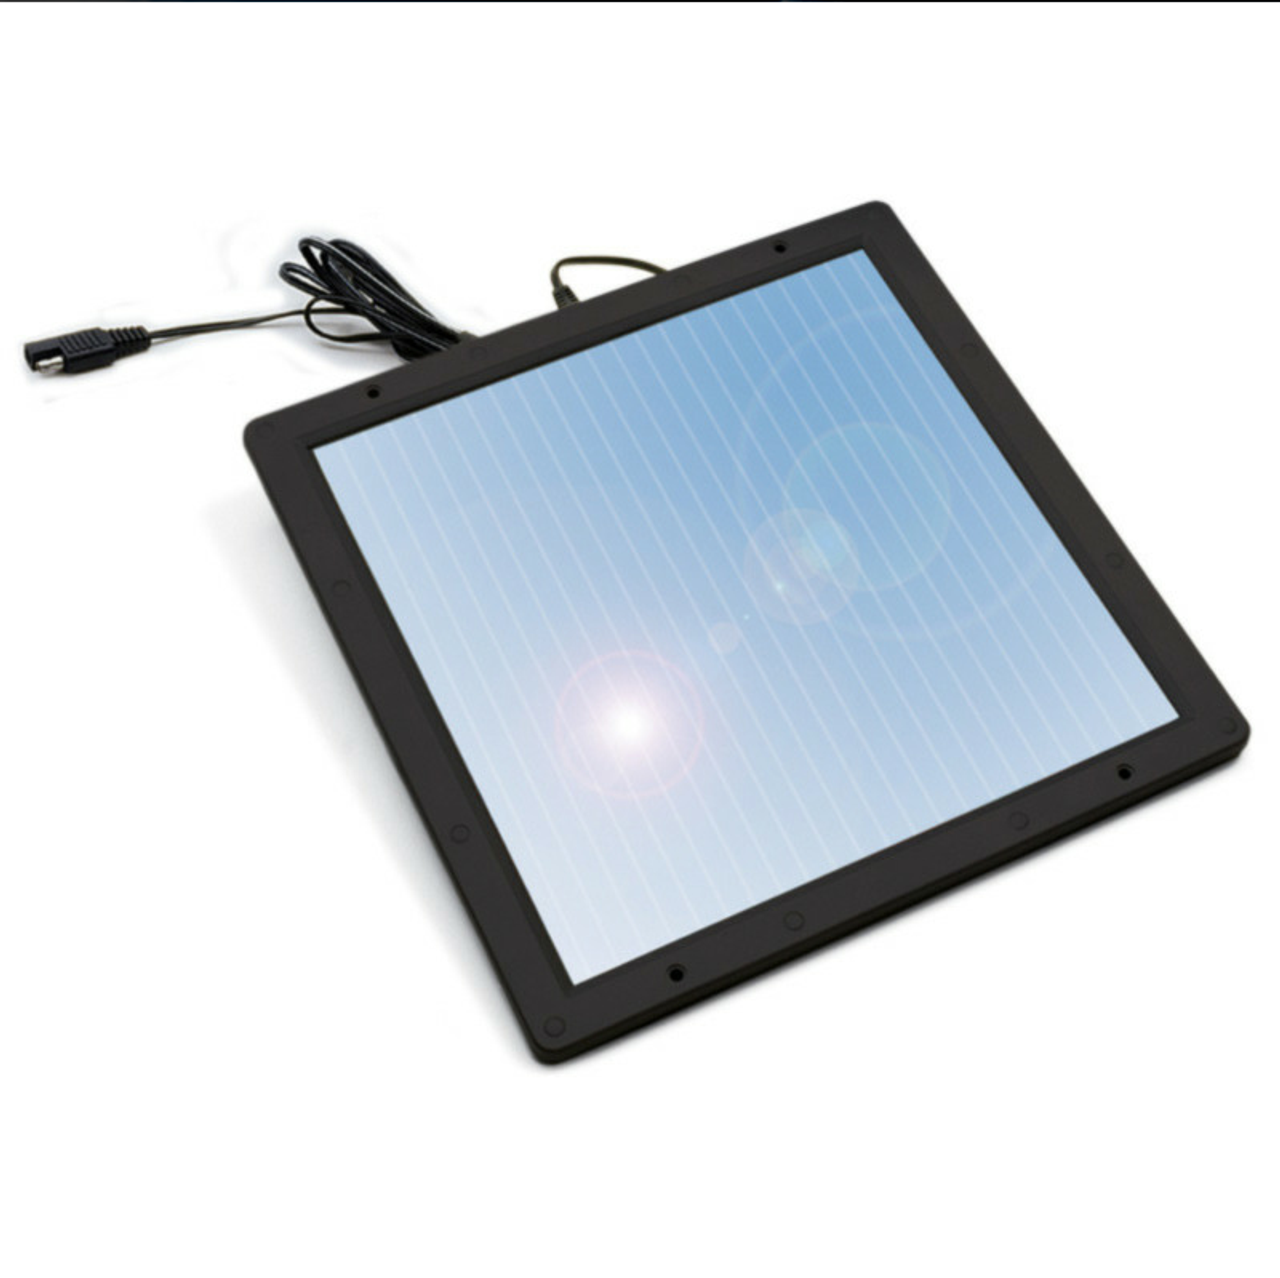 5-Watt Solar Power Trickle Charger